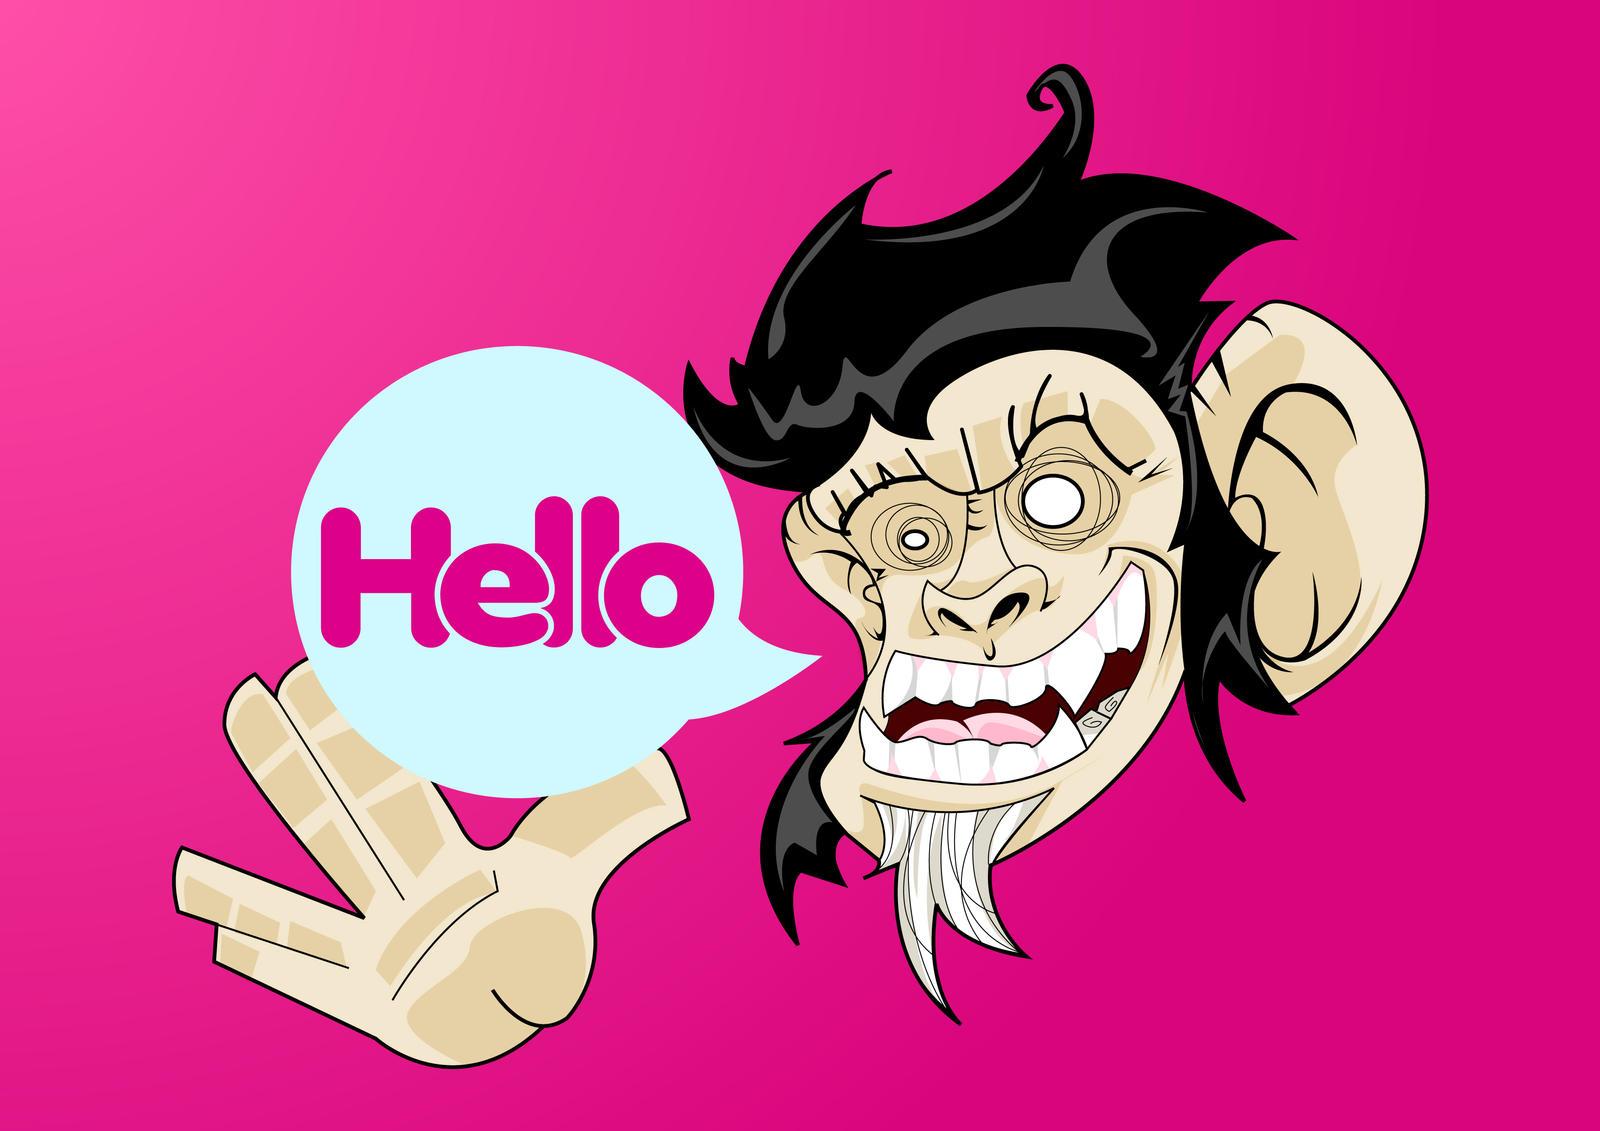 Helloo by Felipefr